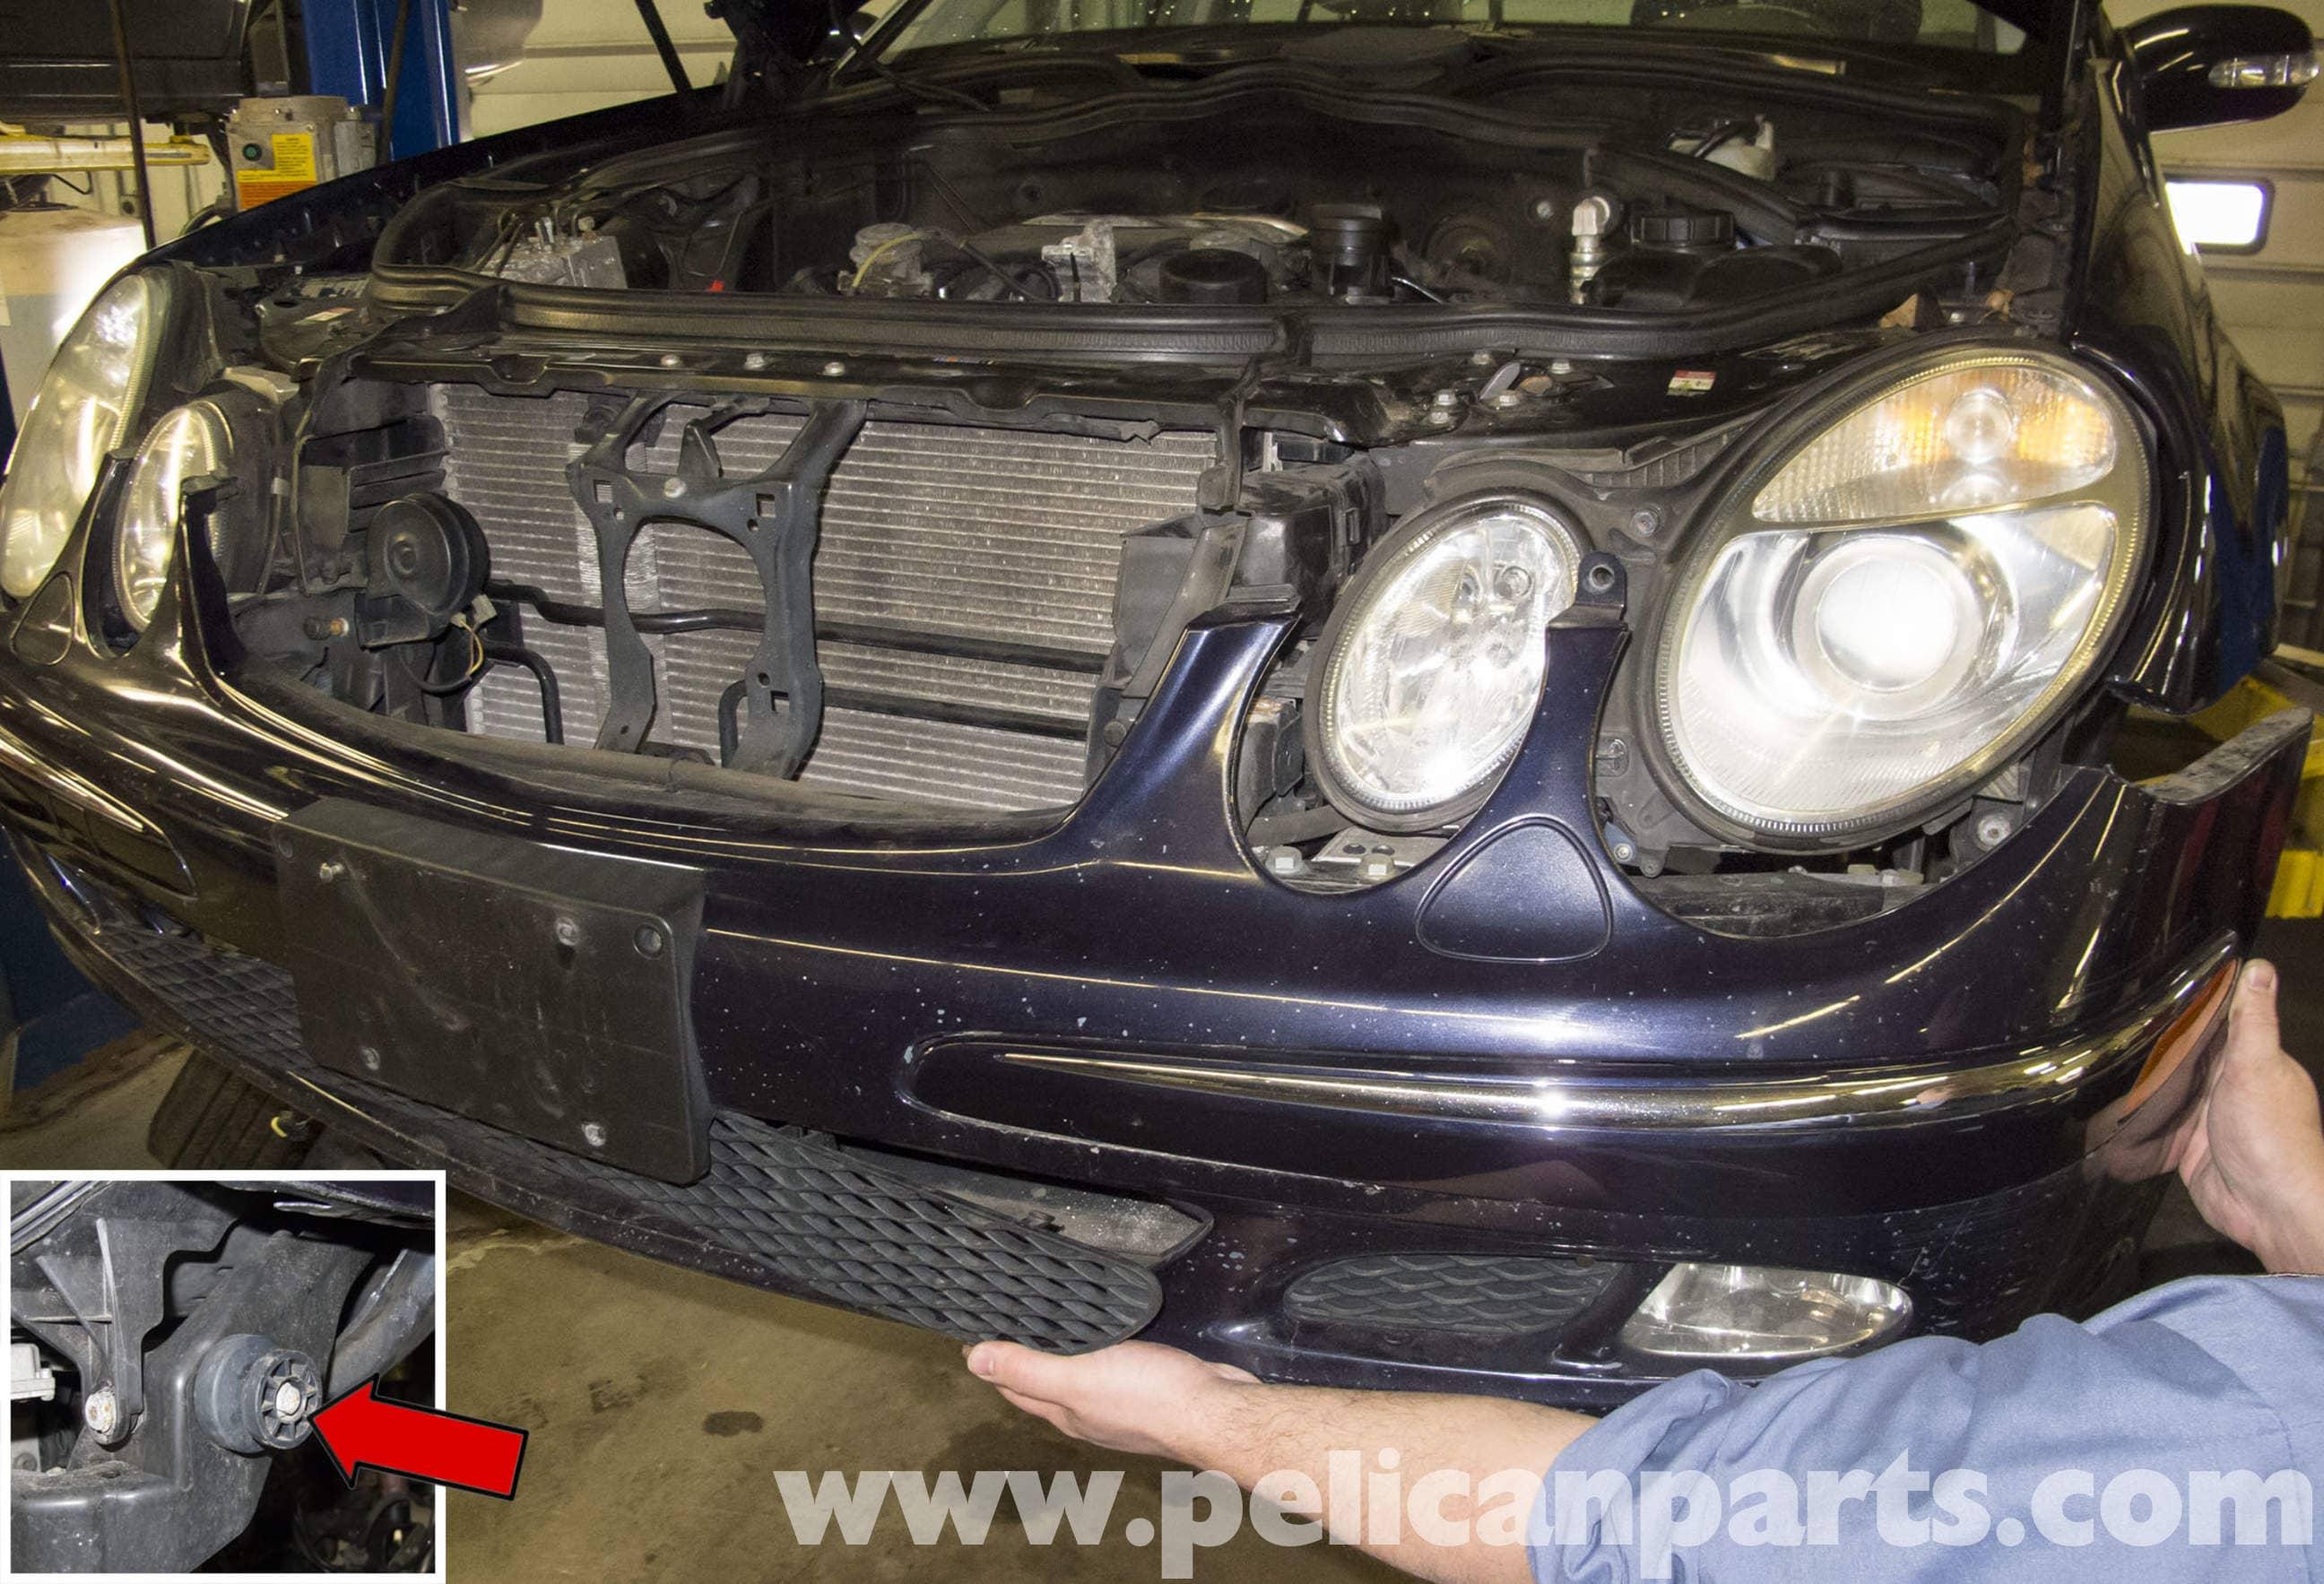 Mercedes-Benz W211 Front Bumper Replacement (2003-2009) E320, E500